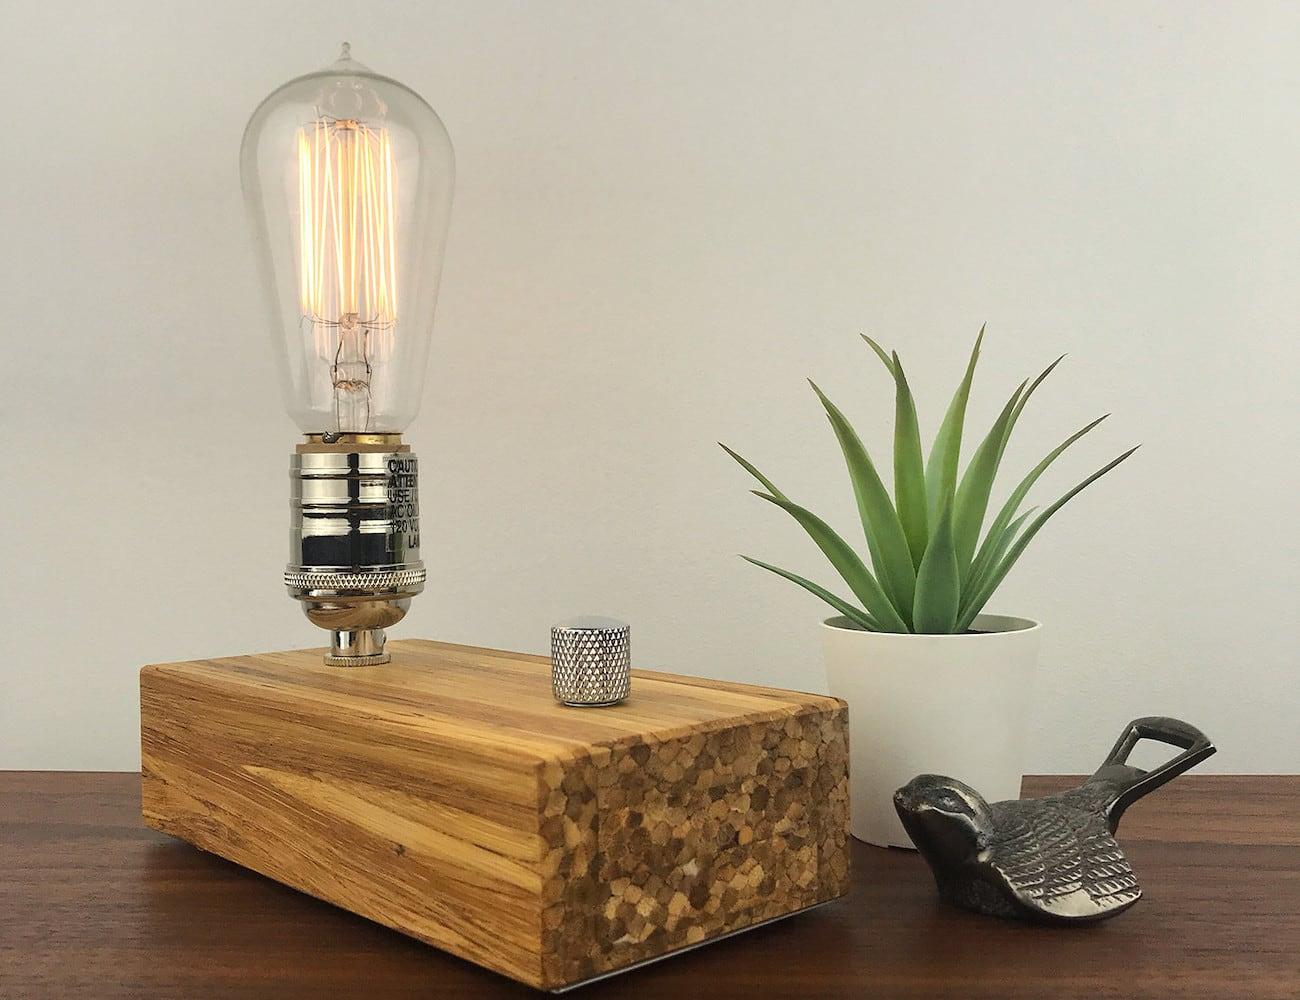 East Van Light X ChopValue Industrial Bamboo Lamps